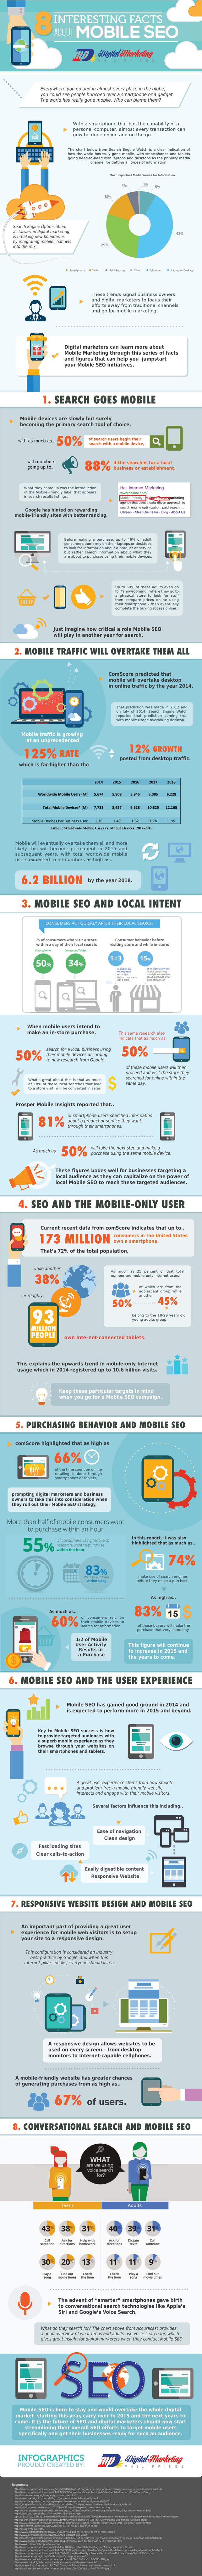 infographie-seo-mobile-2015